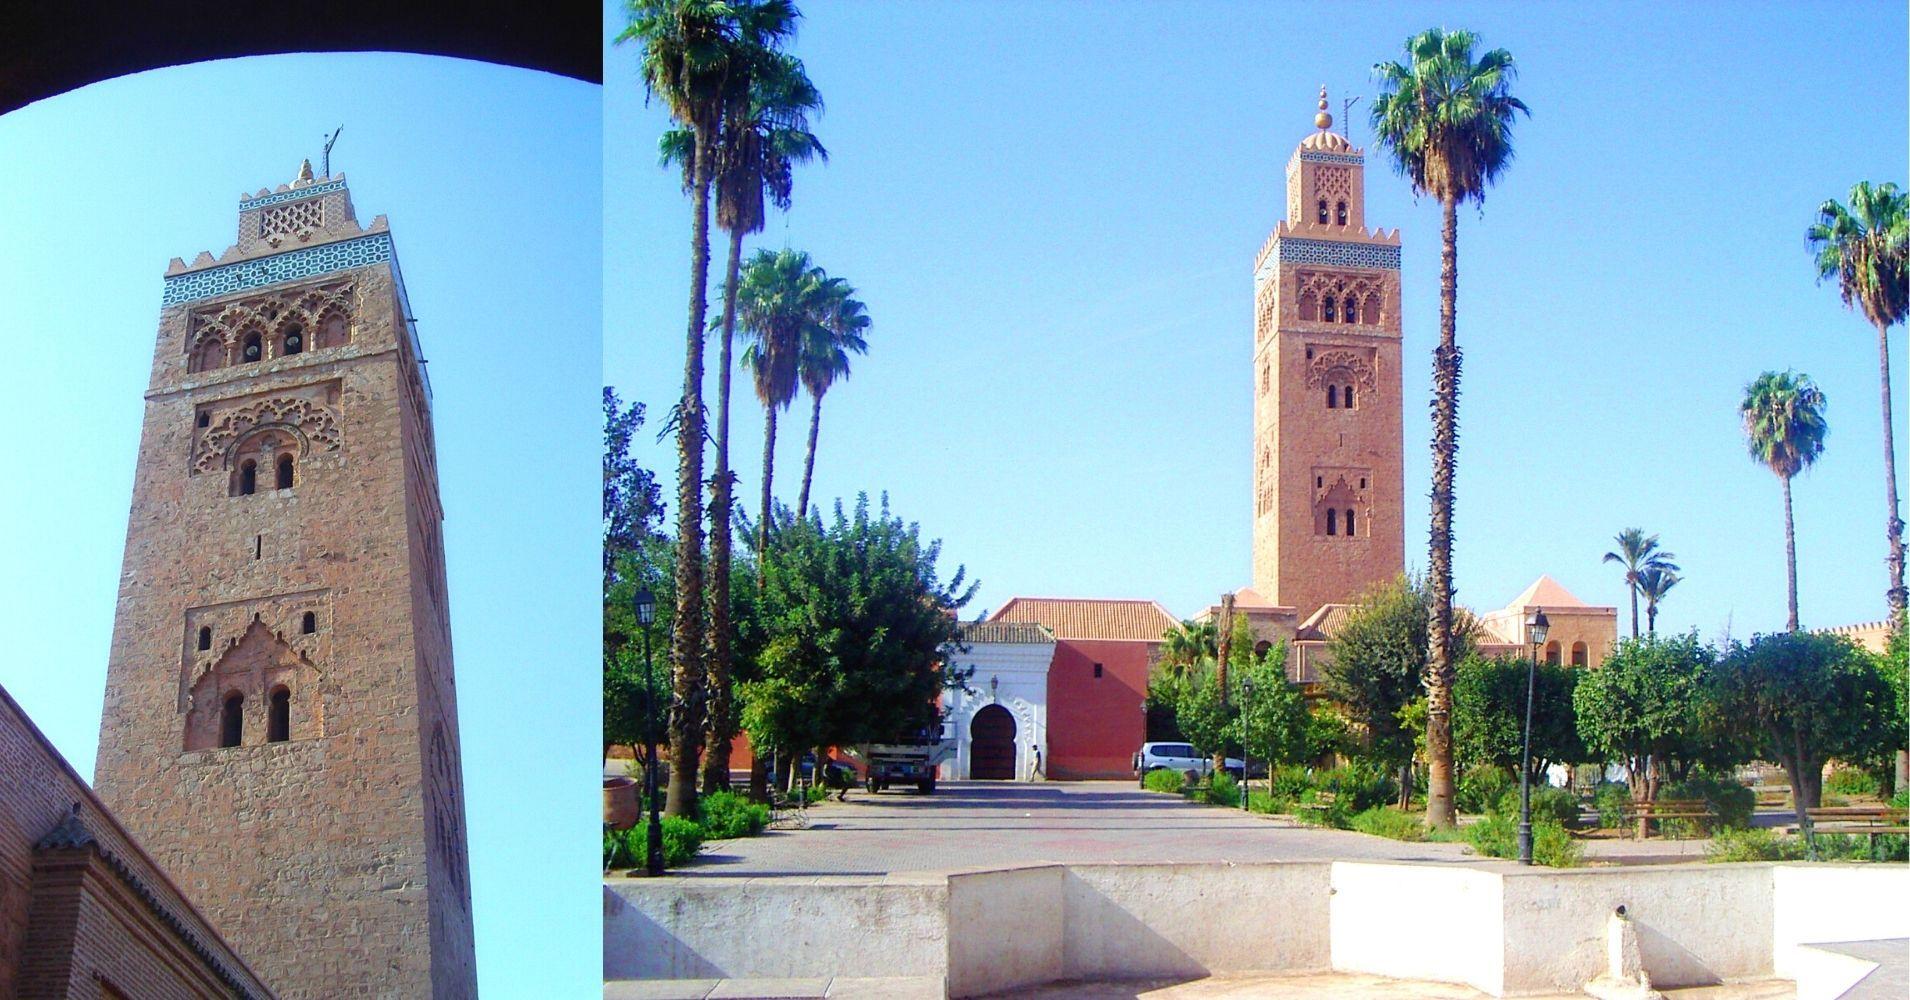 La Mezquita de la Koutoubia, Marrakech. Marruecos.